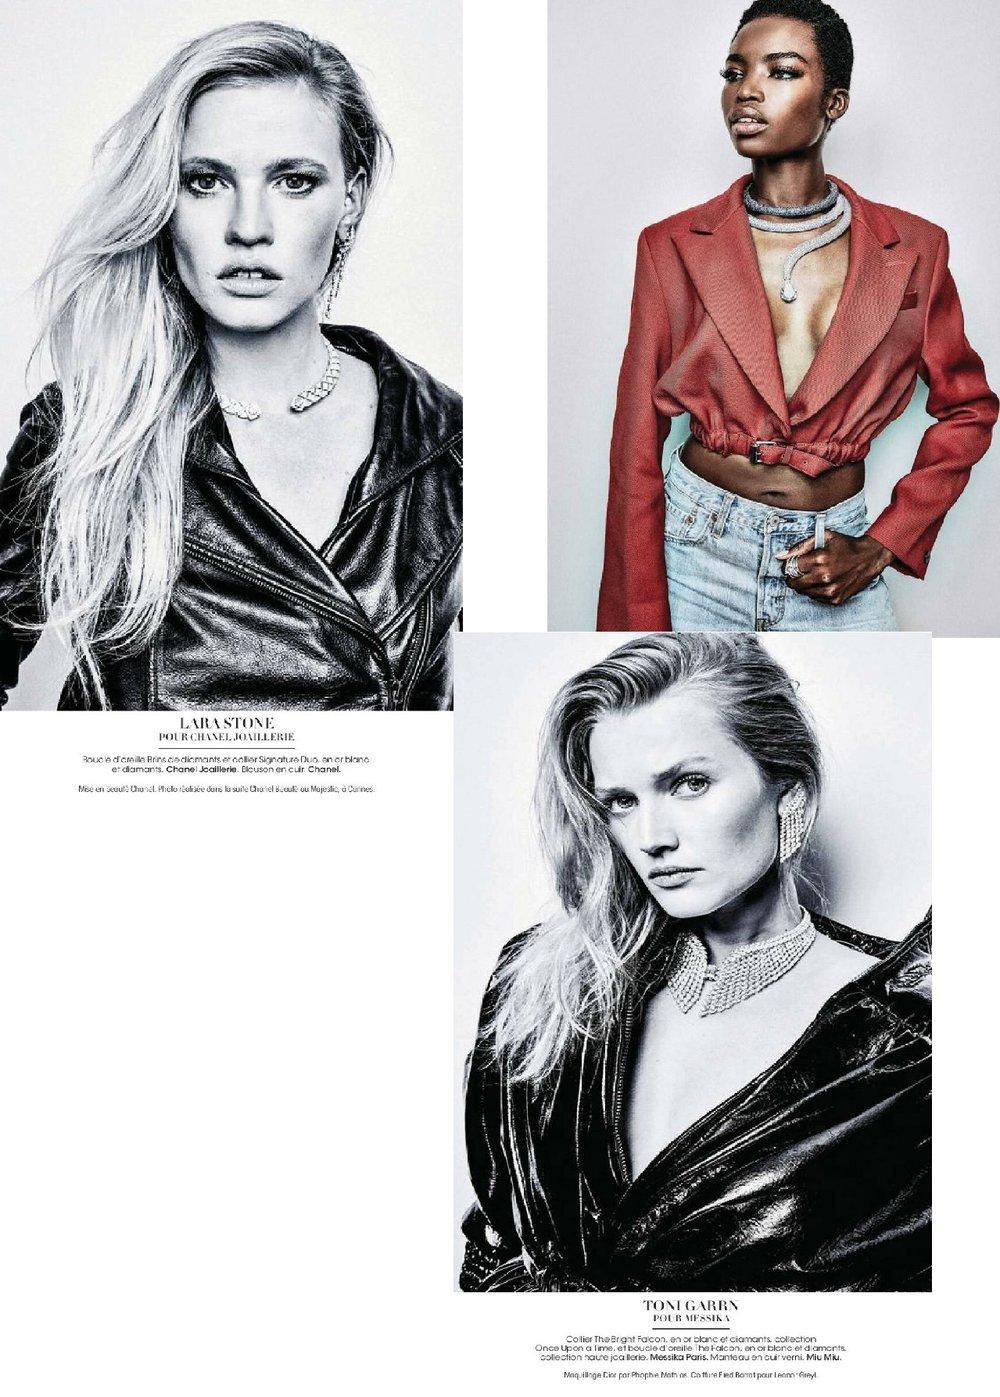 Damon Baker Madame Figaro Dec 21, 2018 collage.jpg